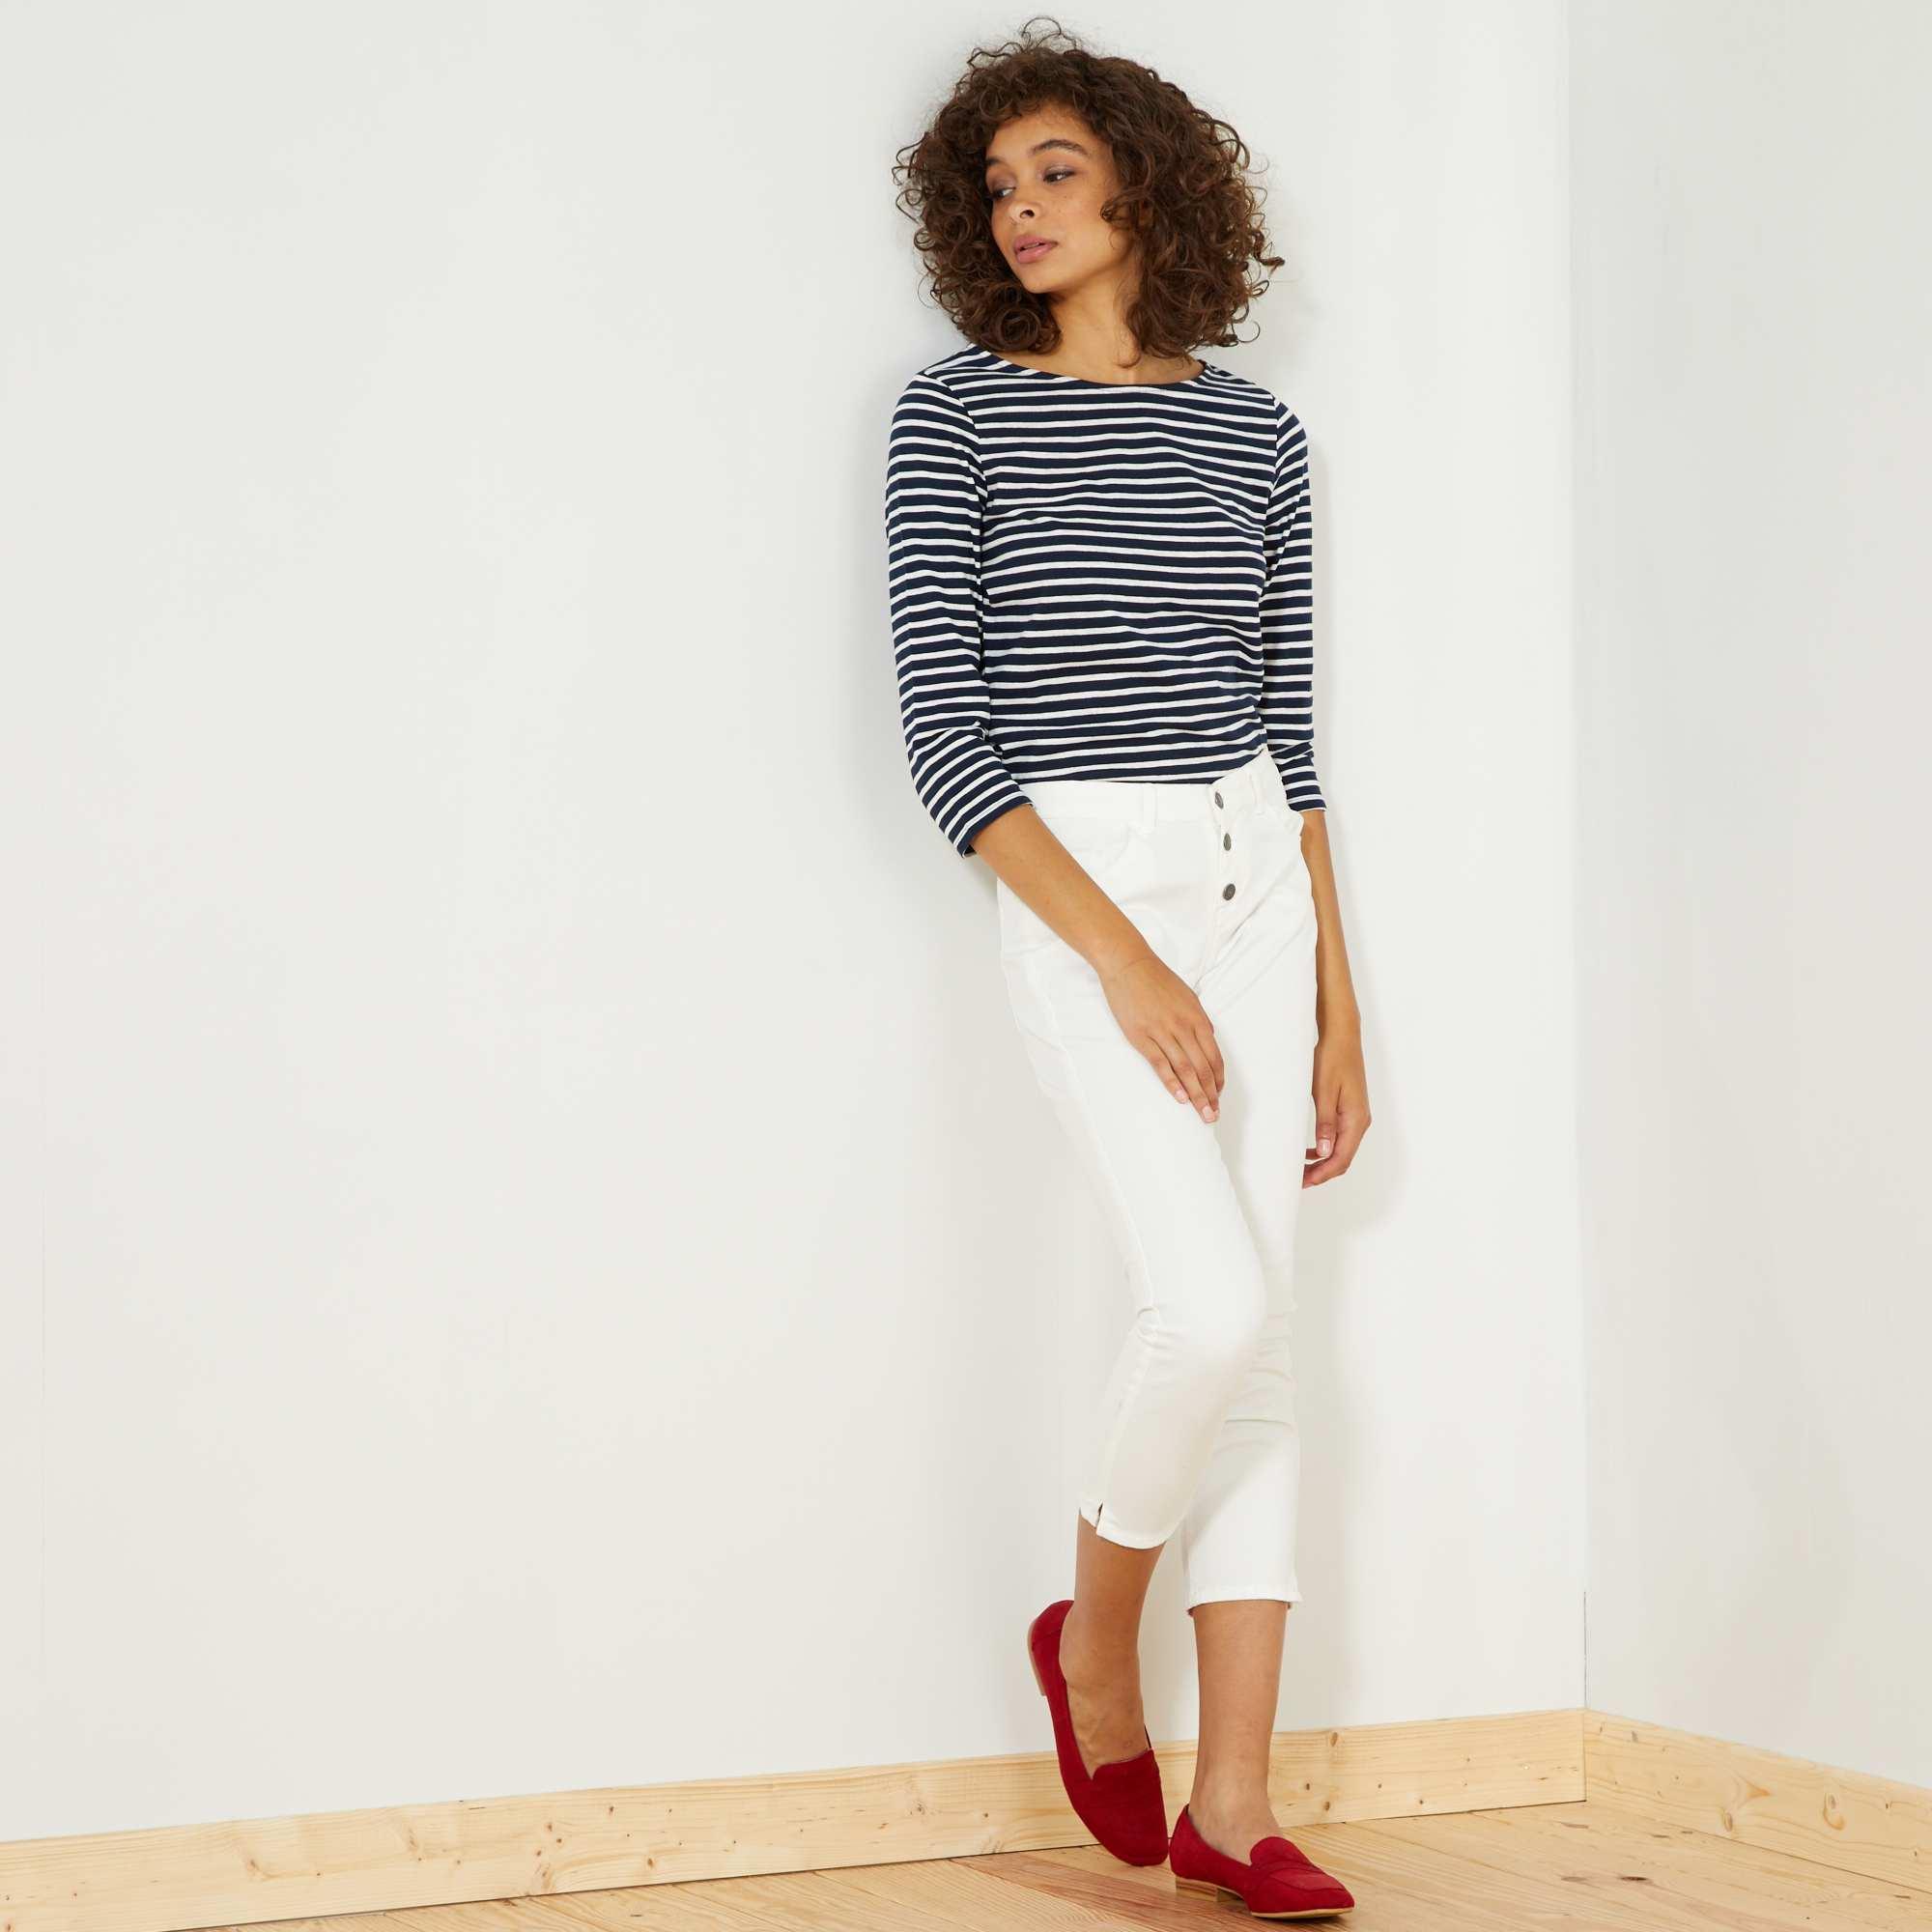 pantalon slim 7 8e taille haute femme blanc kiabi 7 20. Black Bedroom Furniture Sets. Home Design Ideas